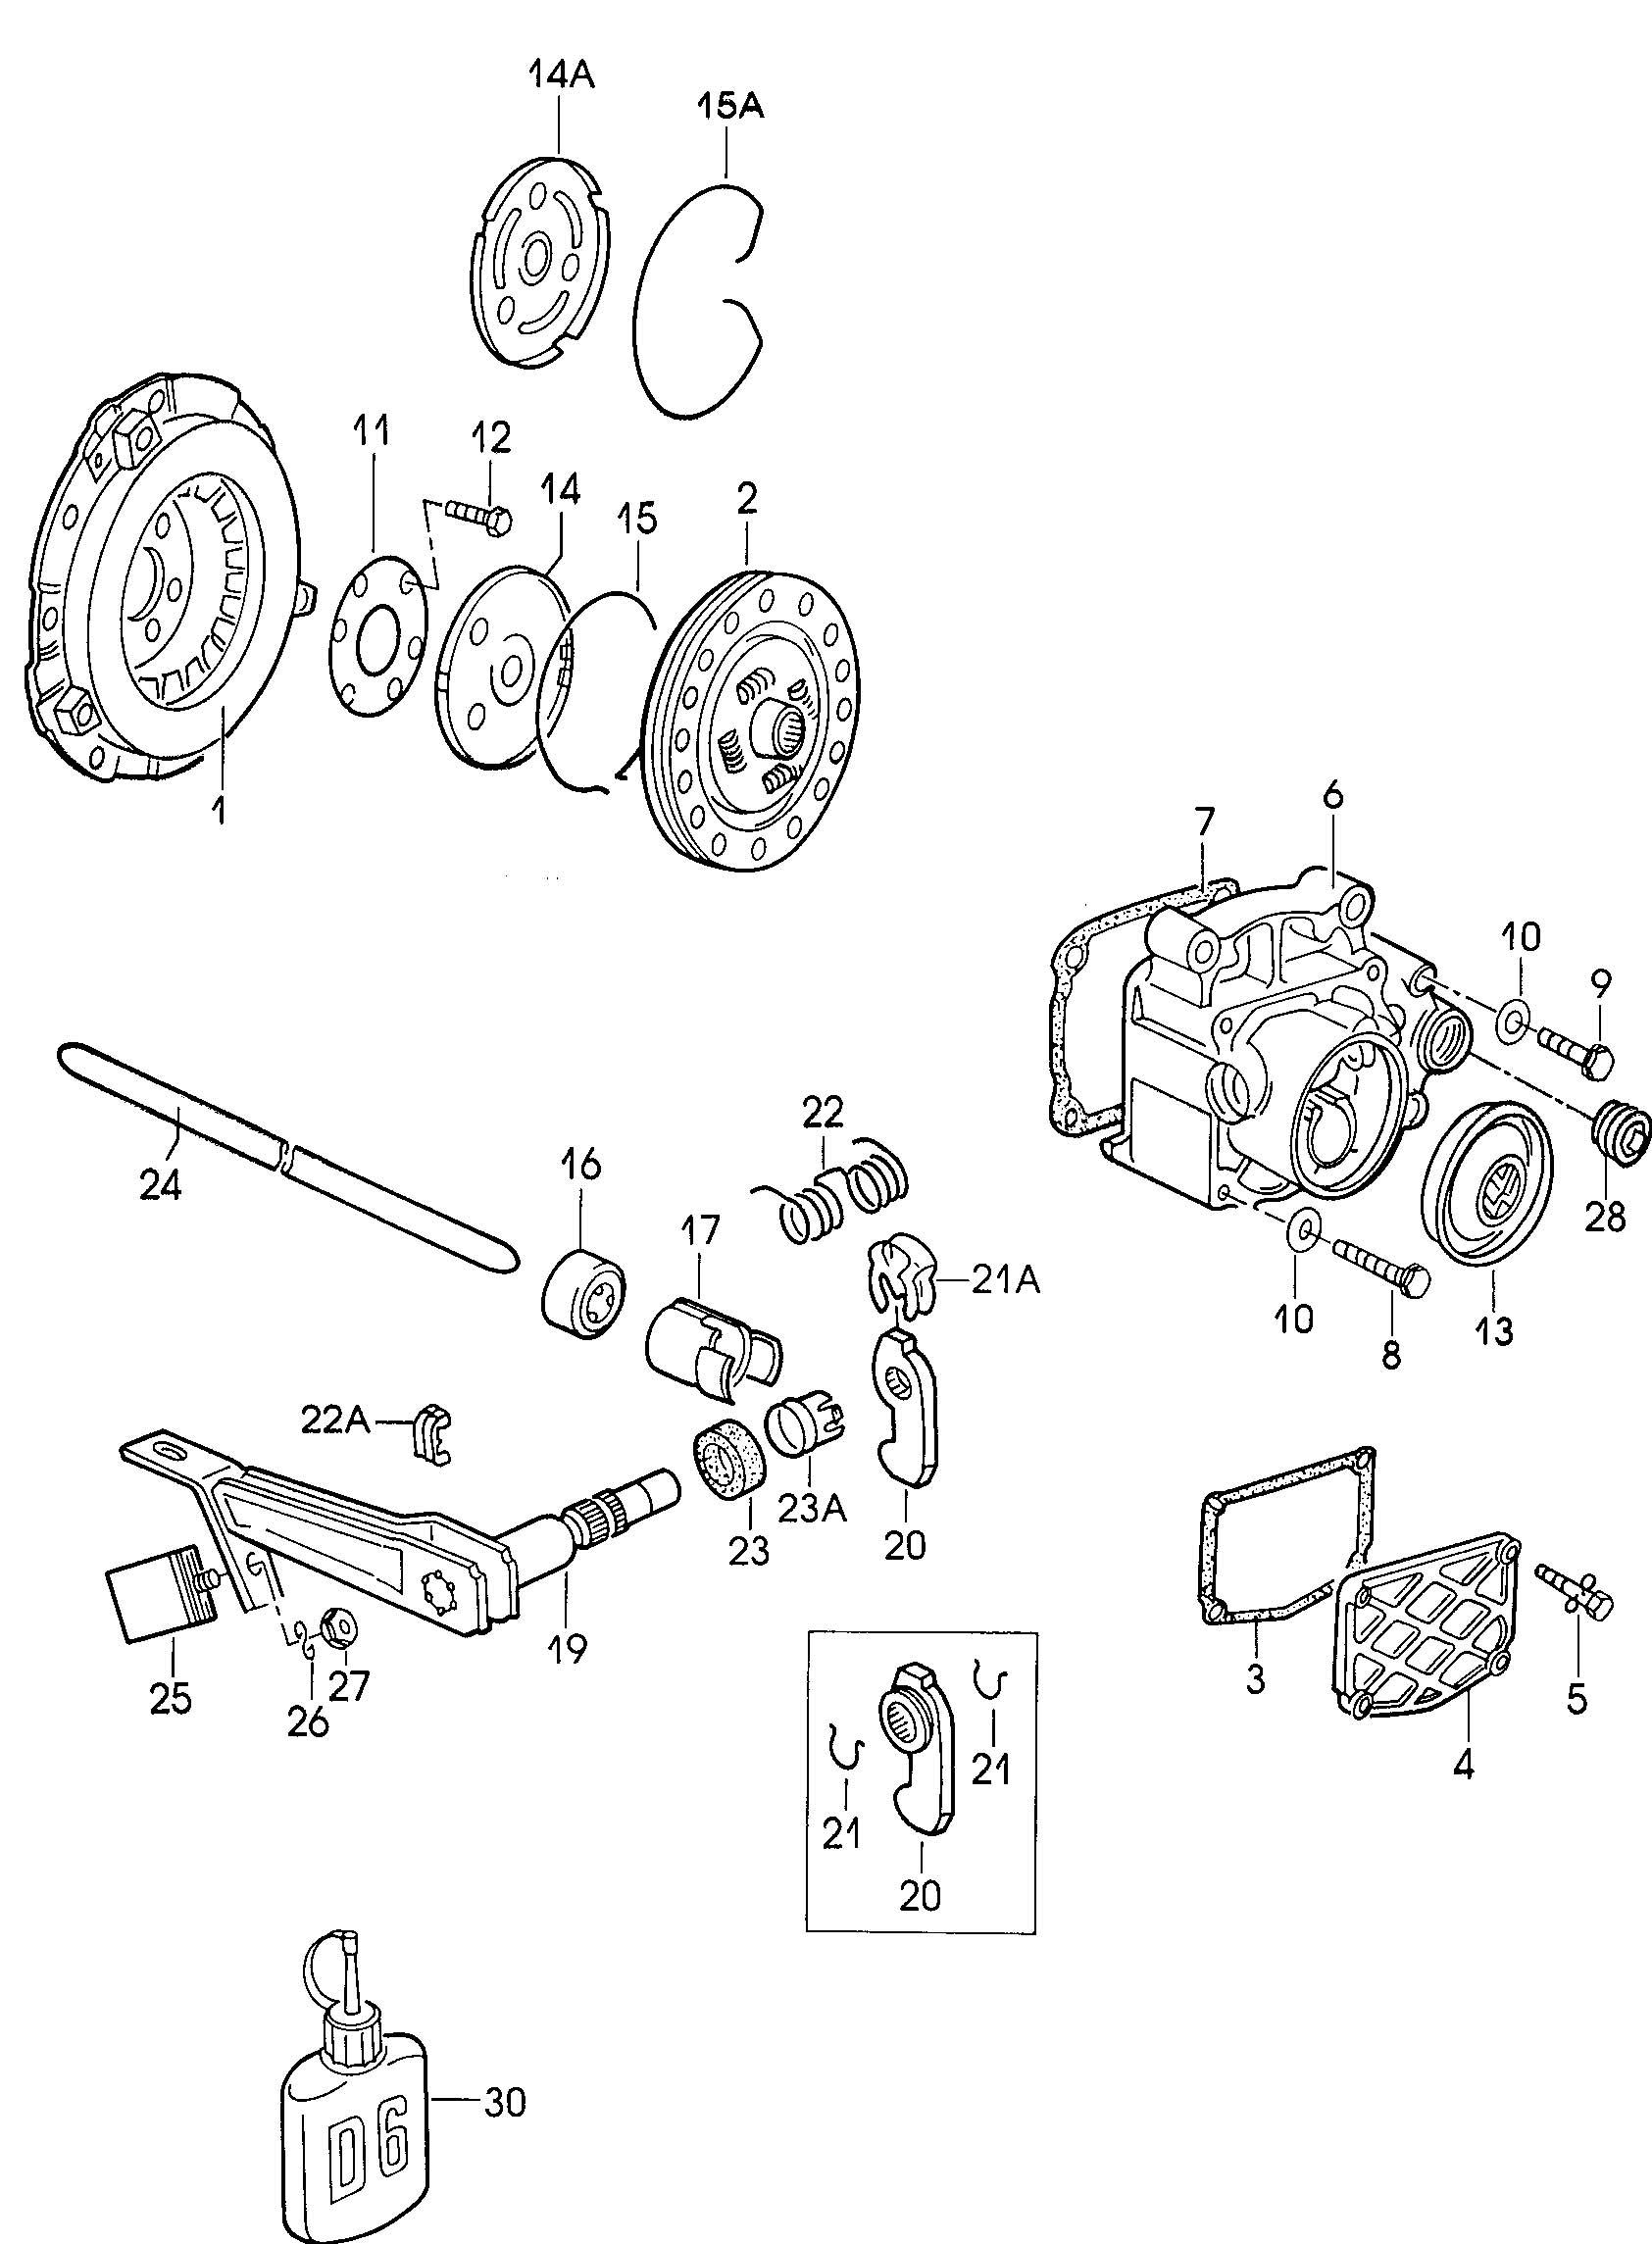 volkswagen eos parts diagram hyundai veloster parts